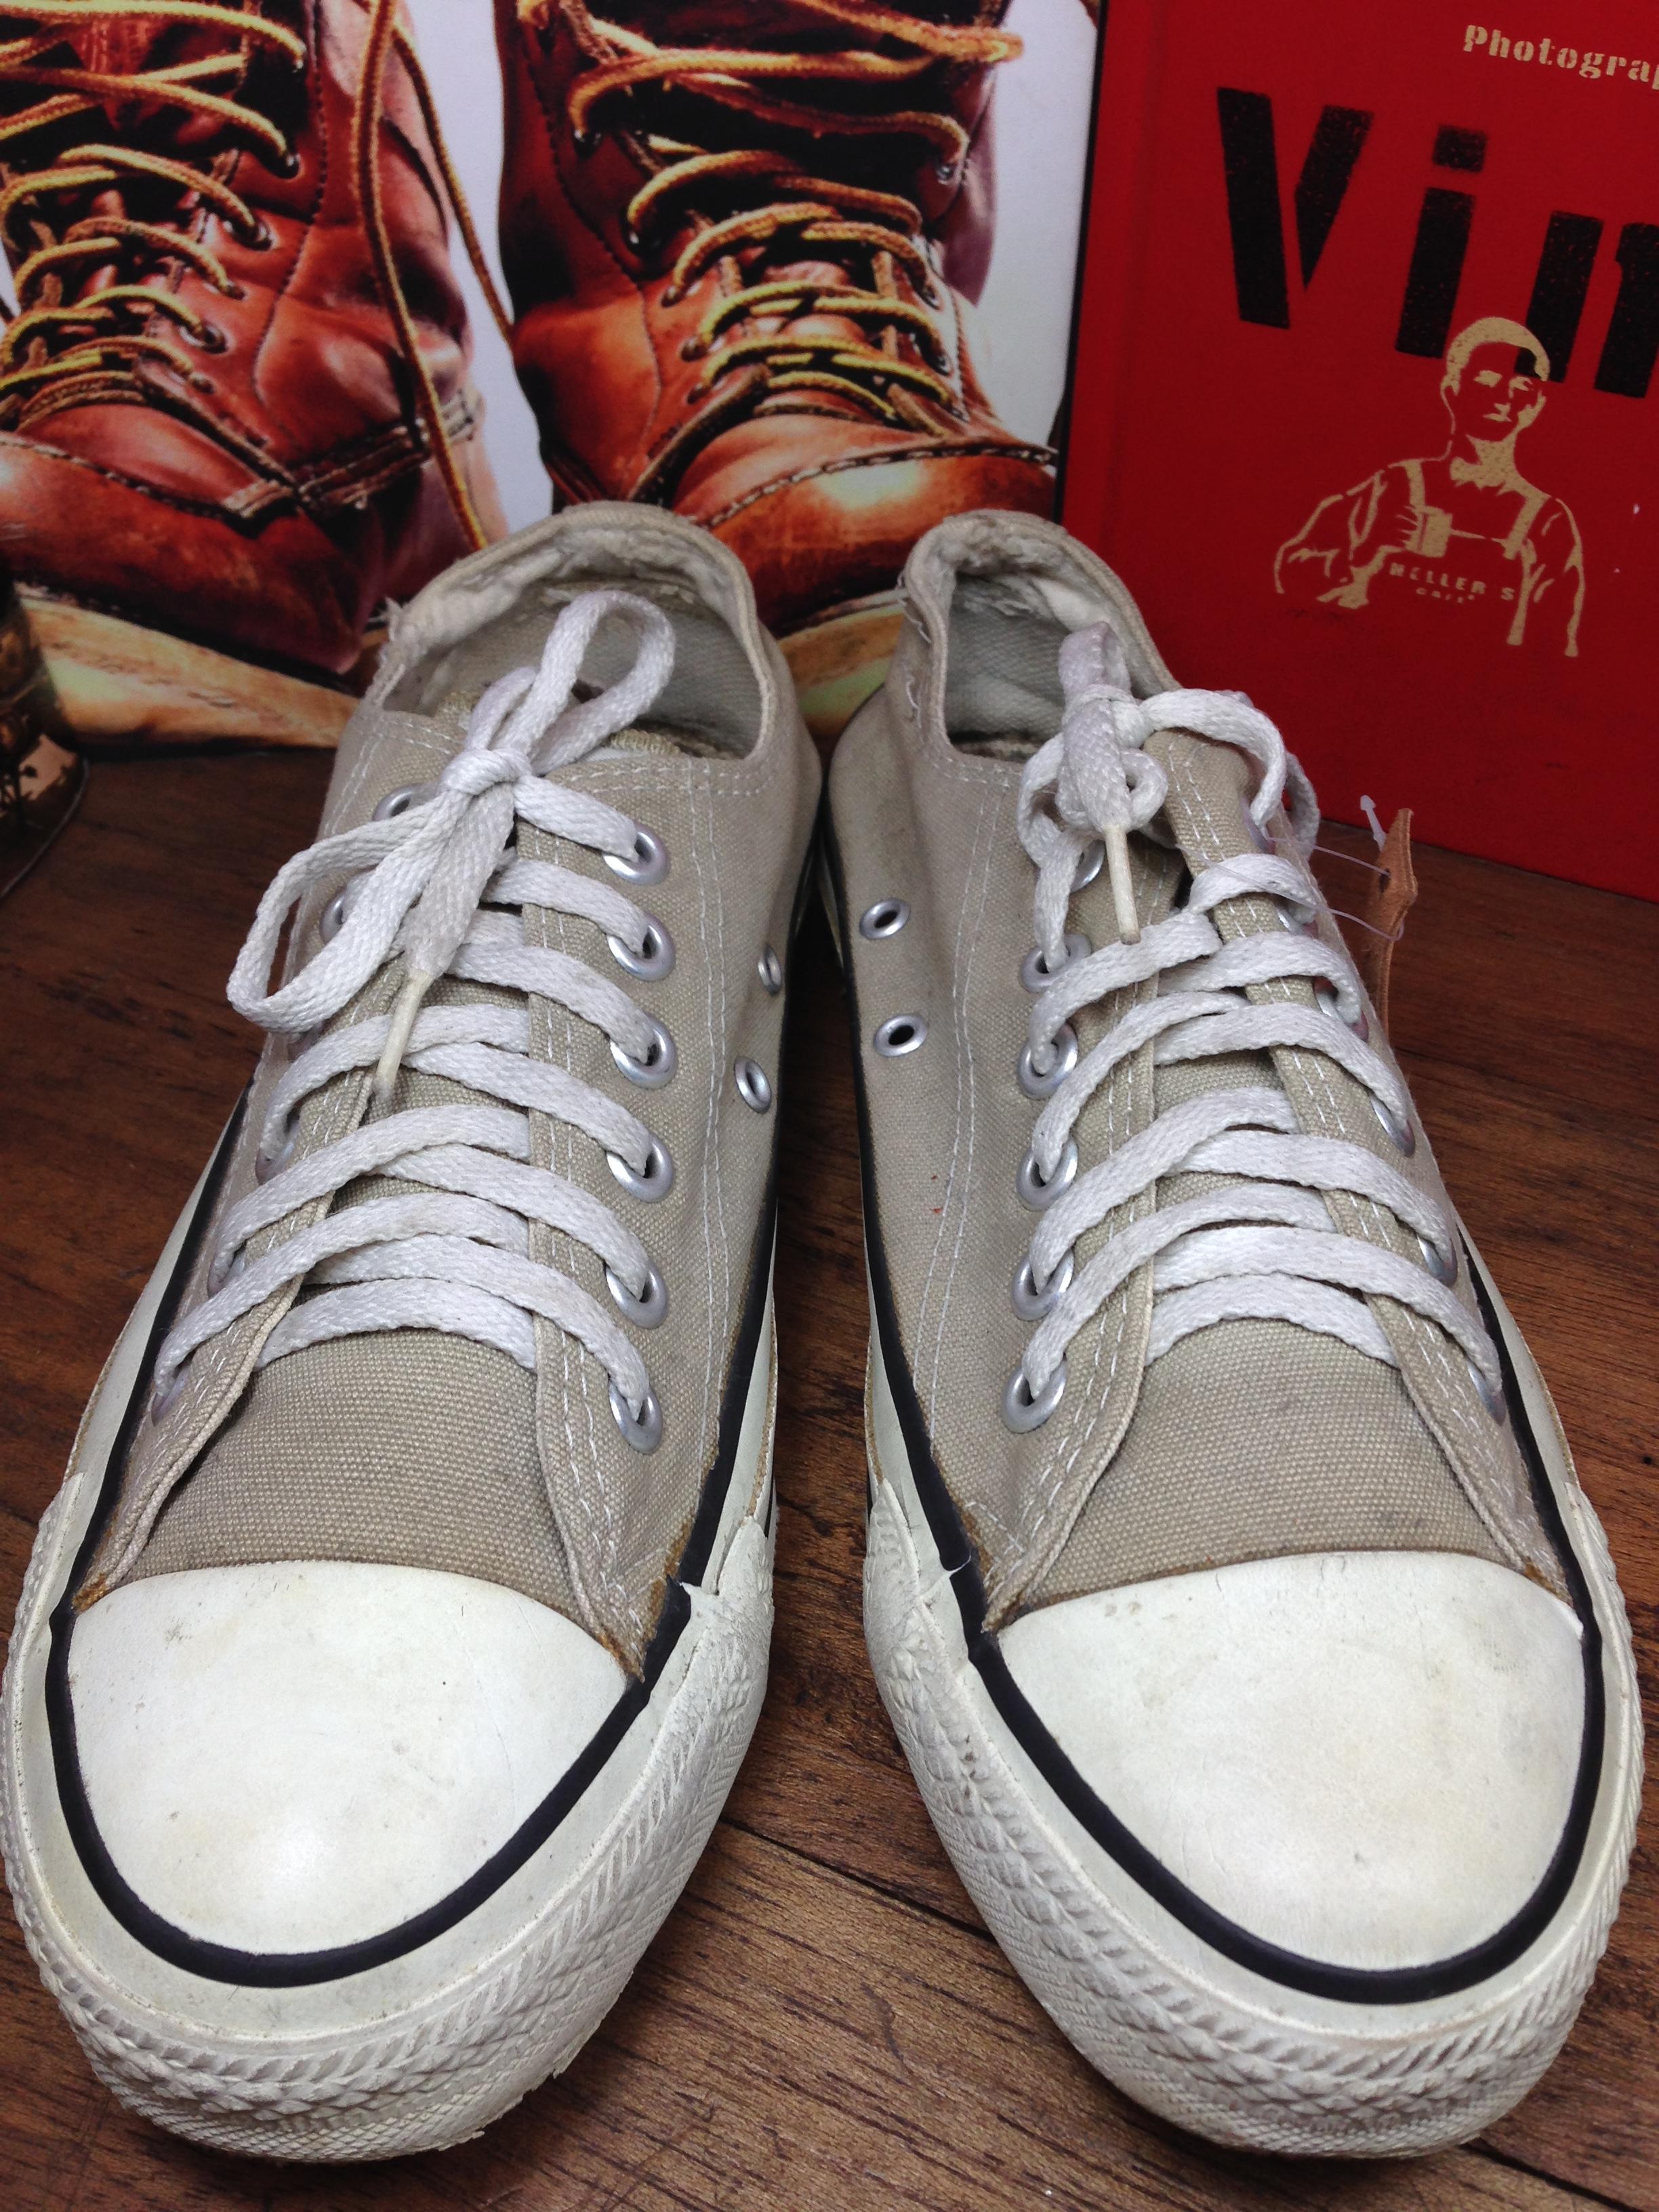 43.Converse USA 90's size 5.5 ตามรูปครับ ราคา 1000